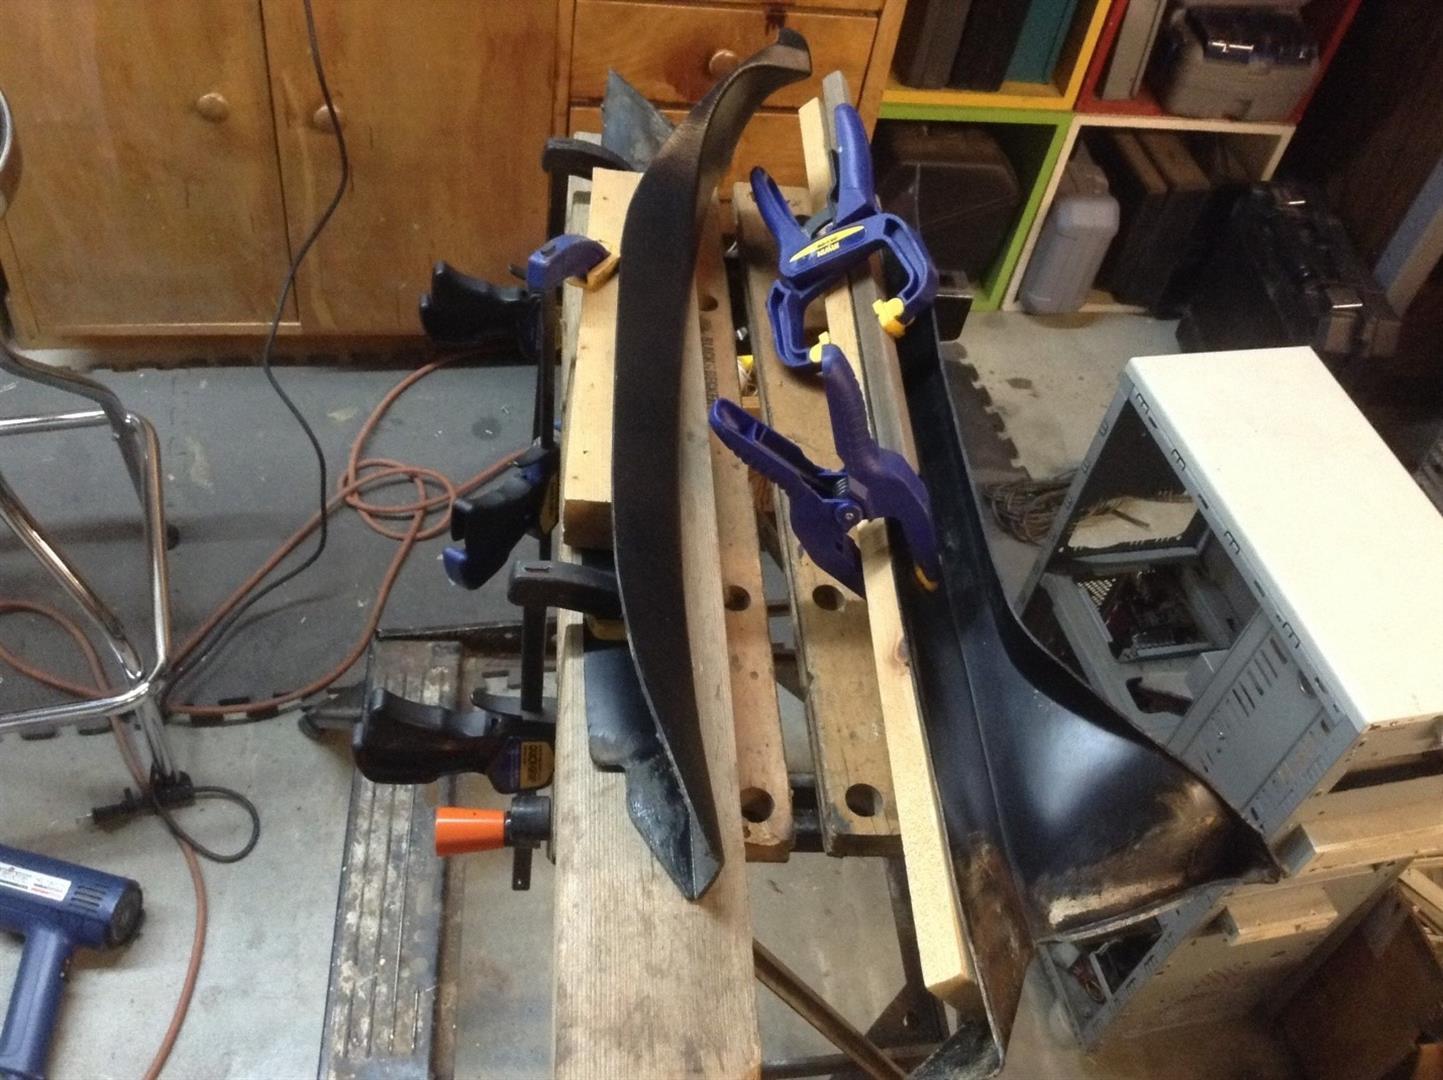 DeLorean A-Pillar Restoration - 01 | DeLoreanDirectory.com